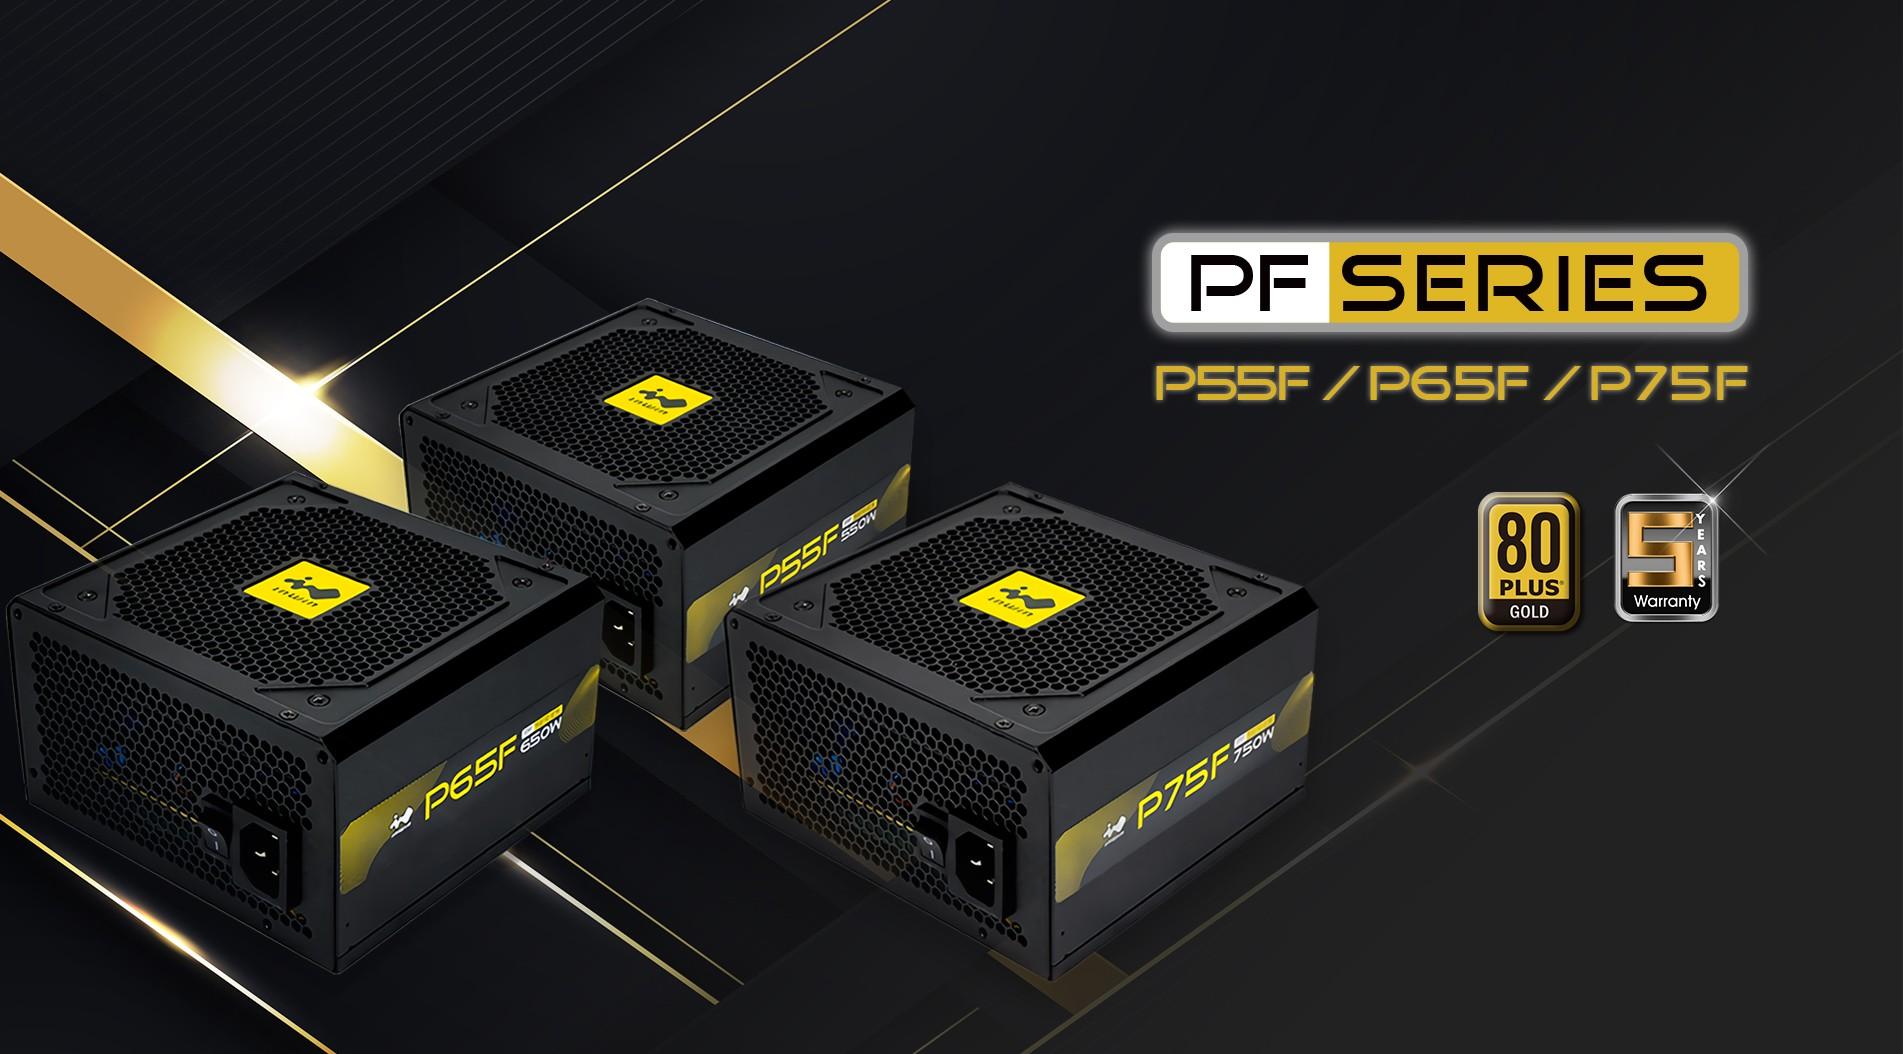 PF Series